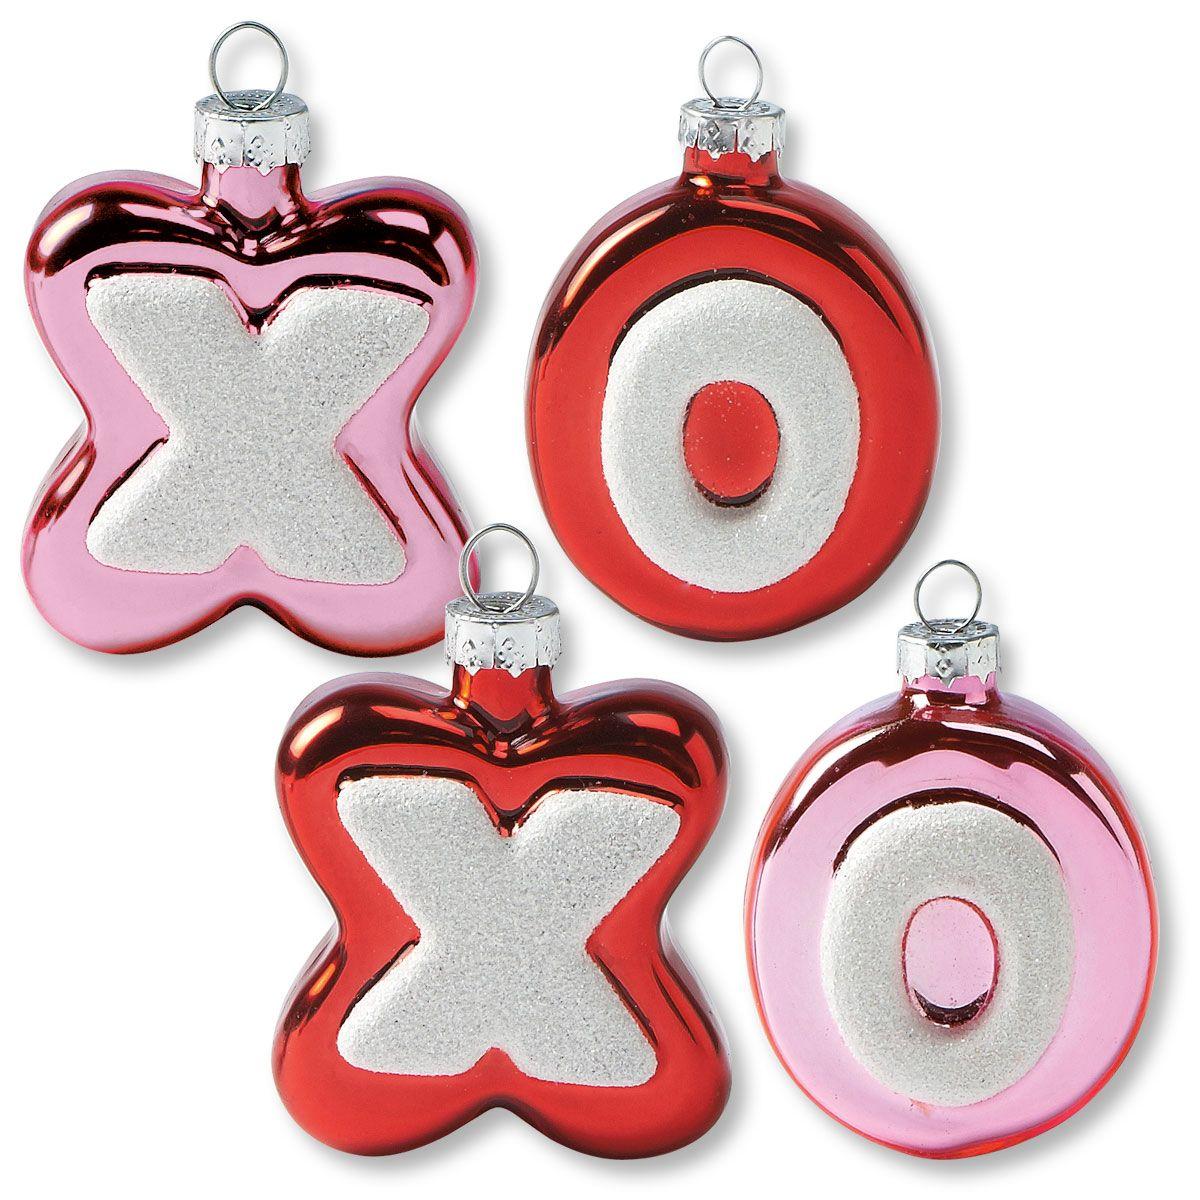 8 Glass XO Ornaments